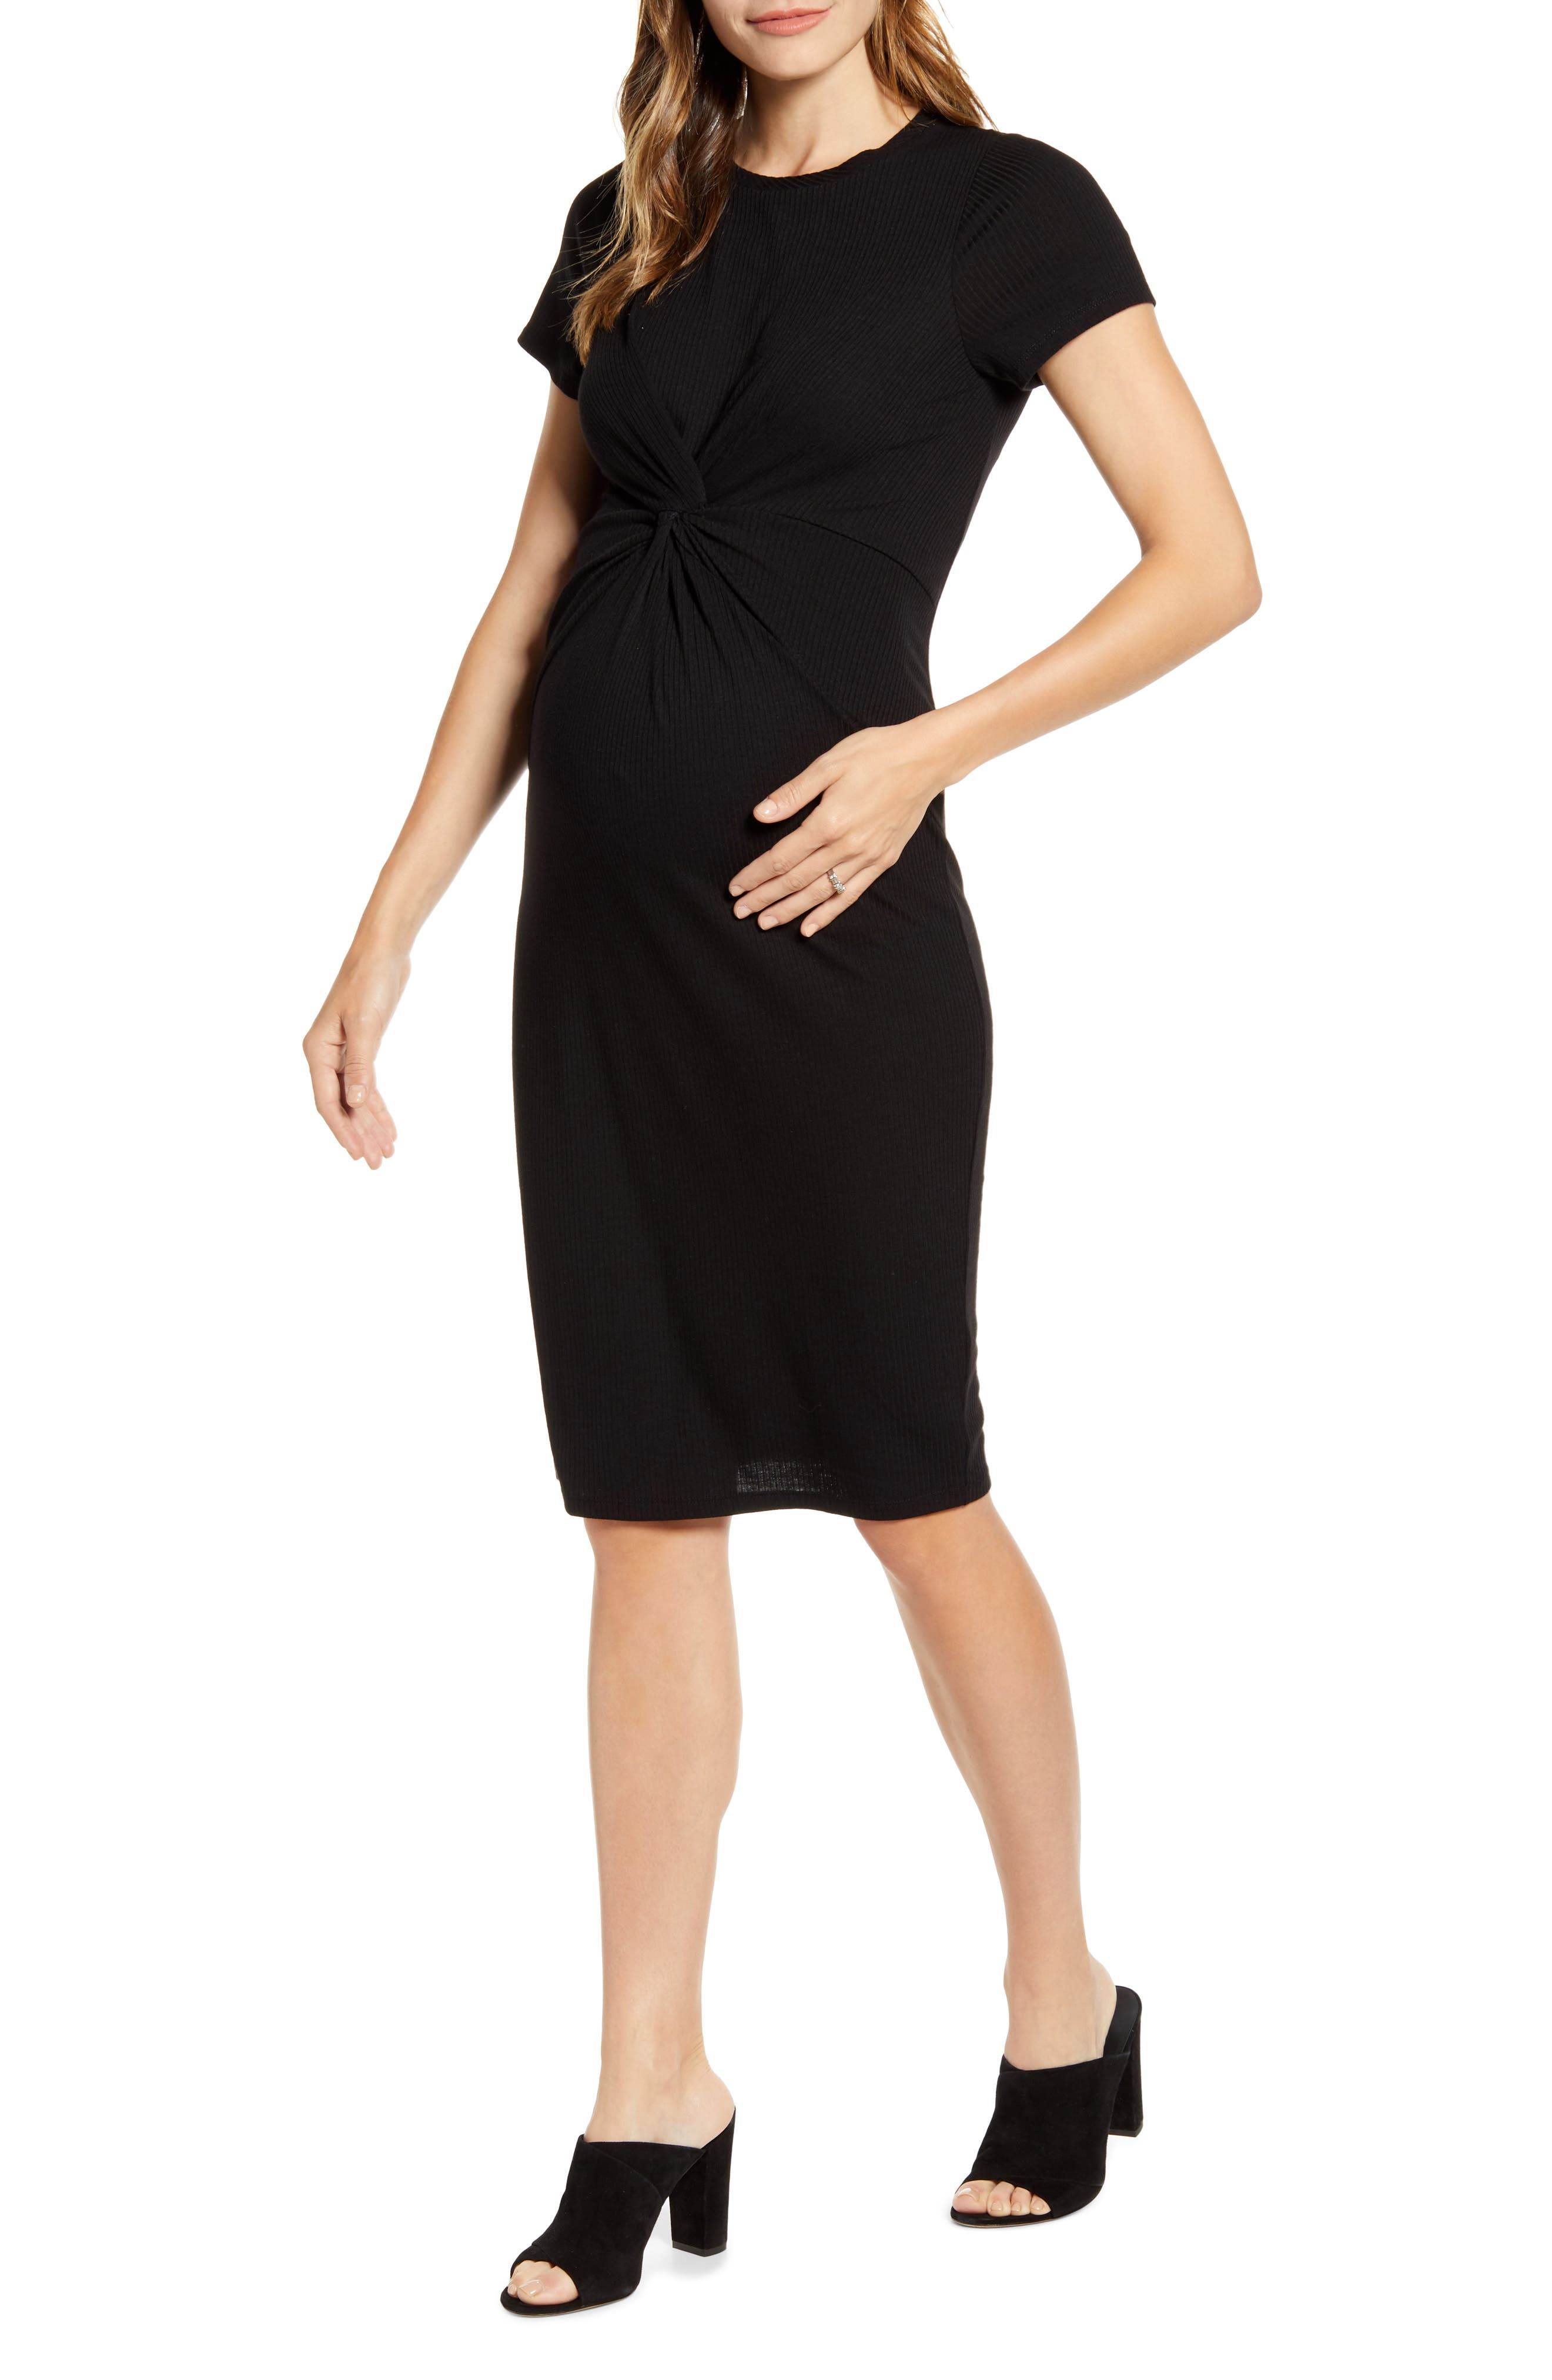 Fourteenth Place Knot Front Maternity Dress, Black